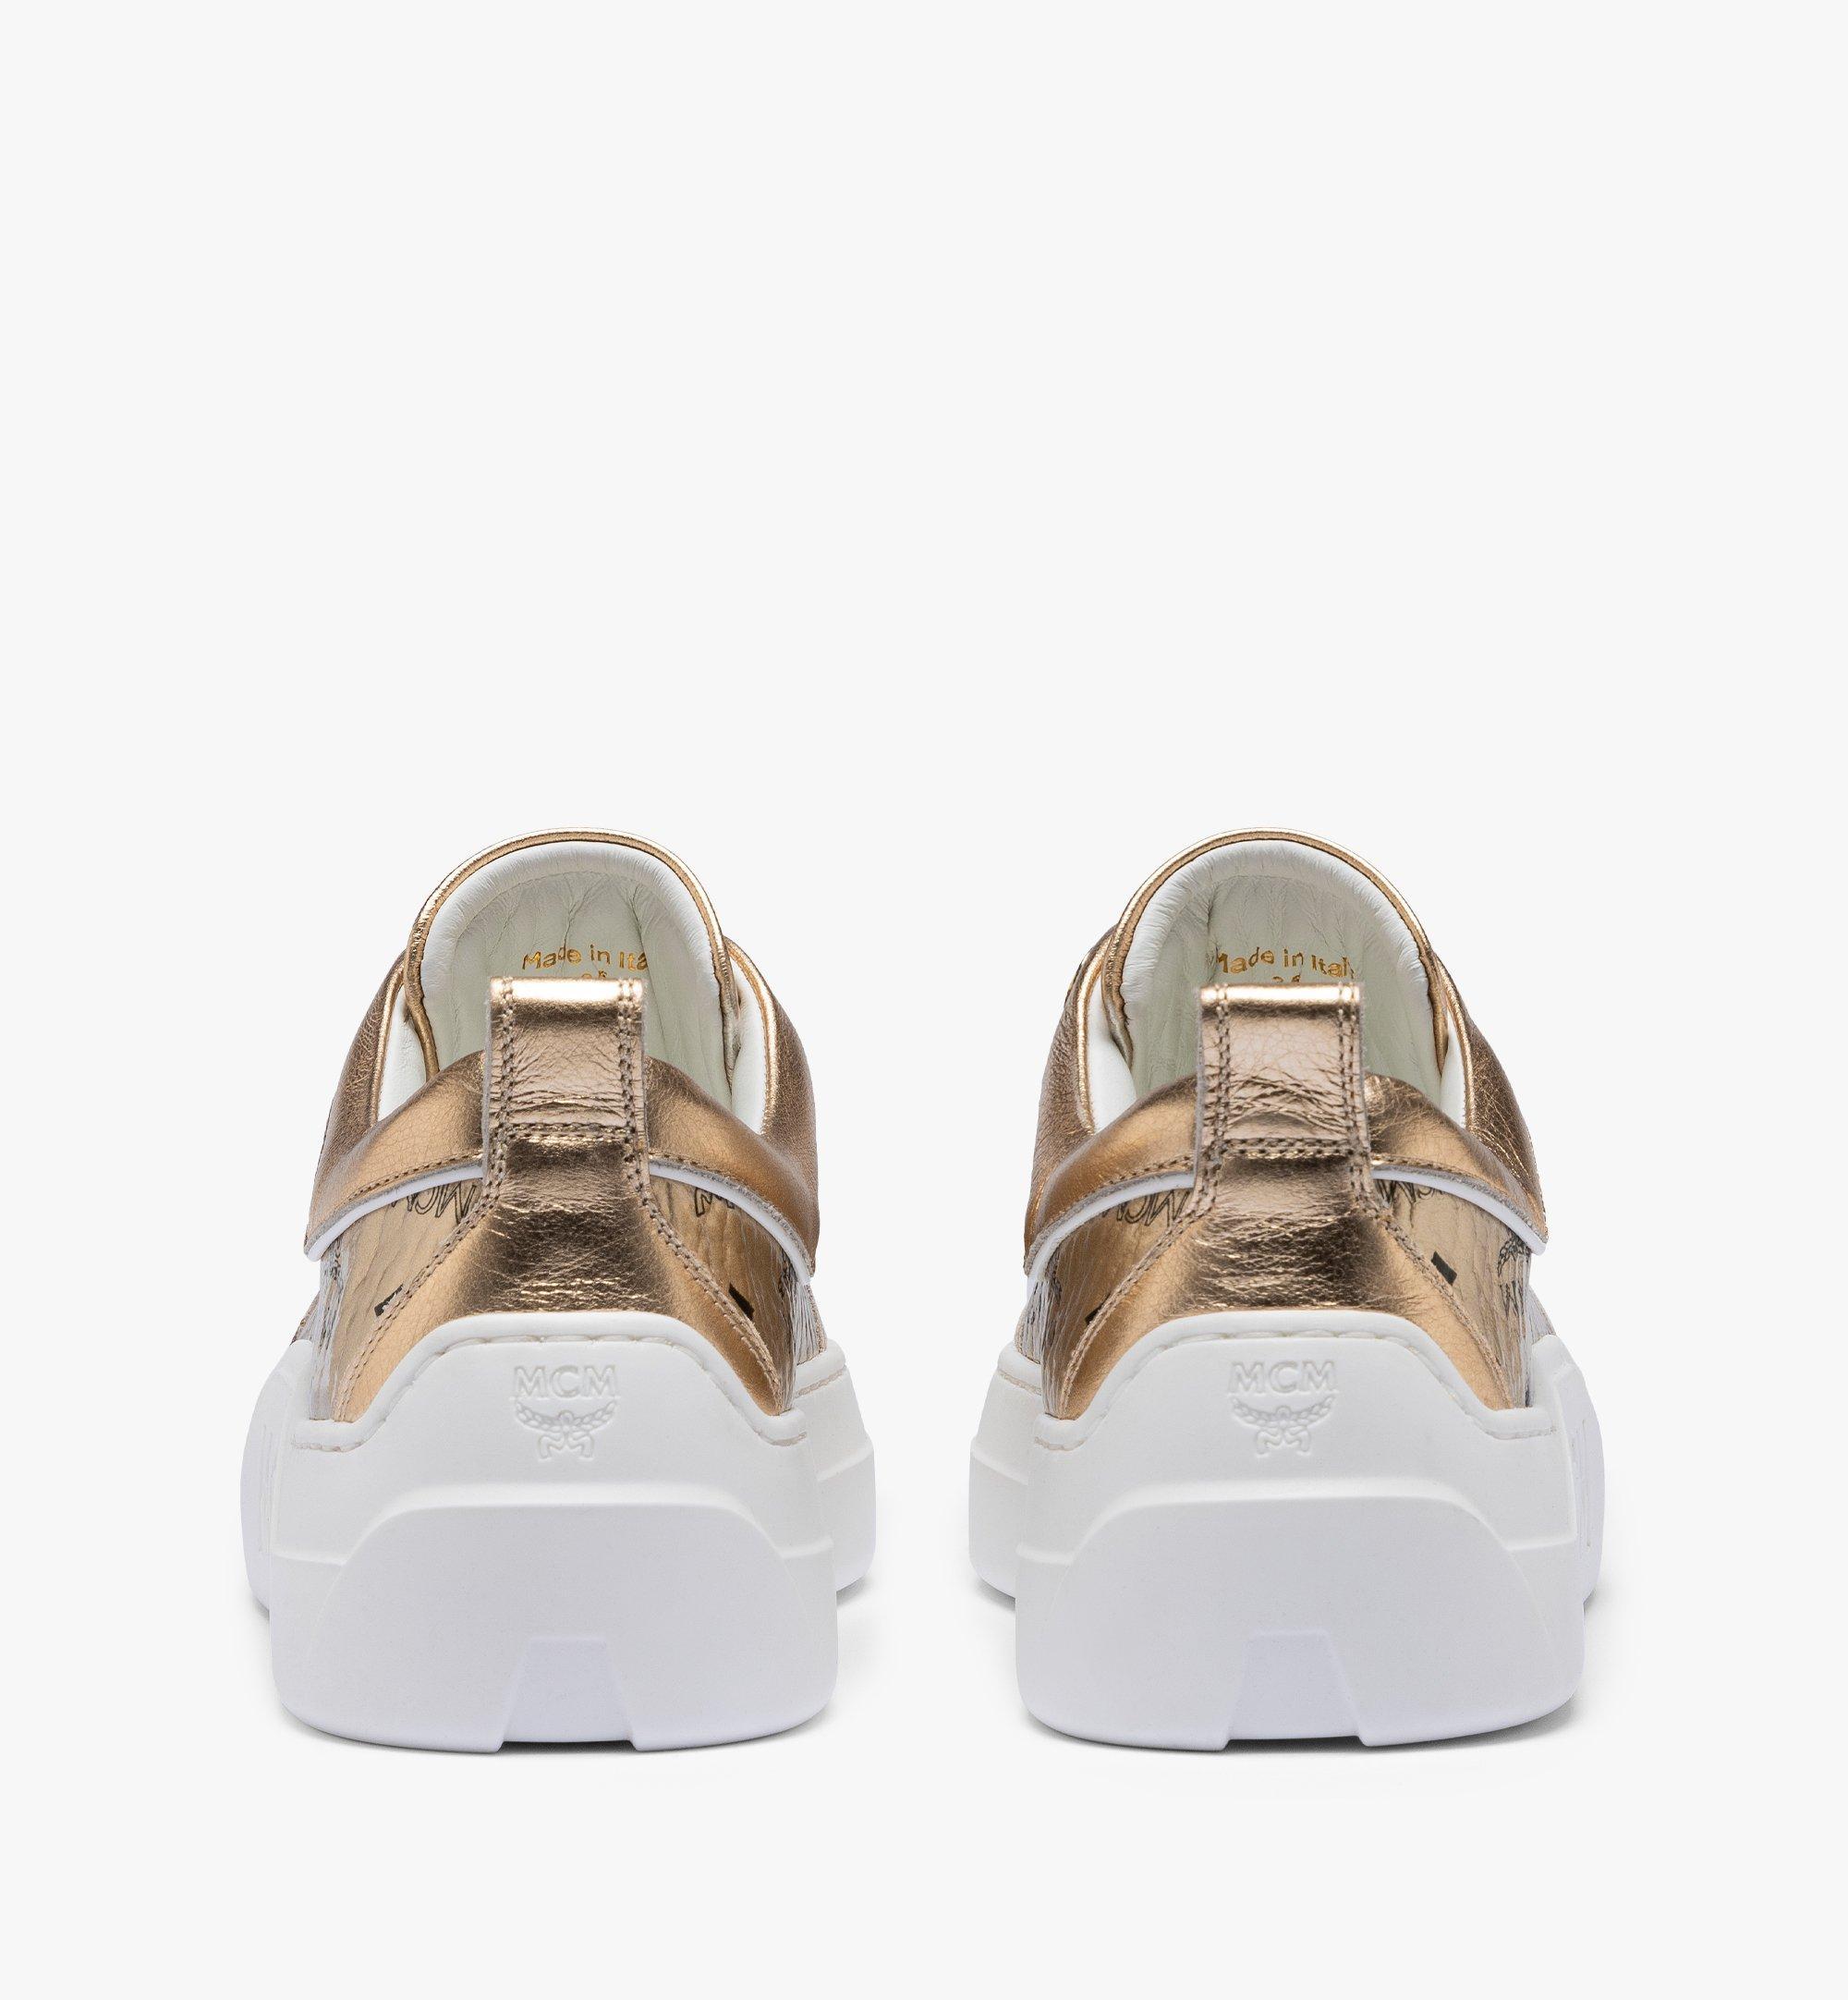 MCM Women's Skyward Platform Sneakers in Visetos Gold MESAAMM19T1035 Alternate View 2